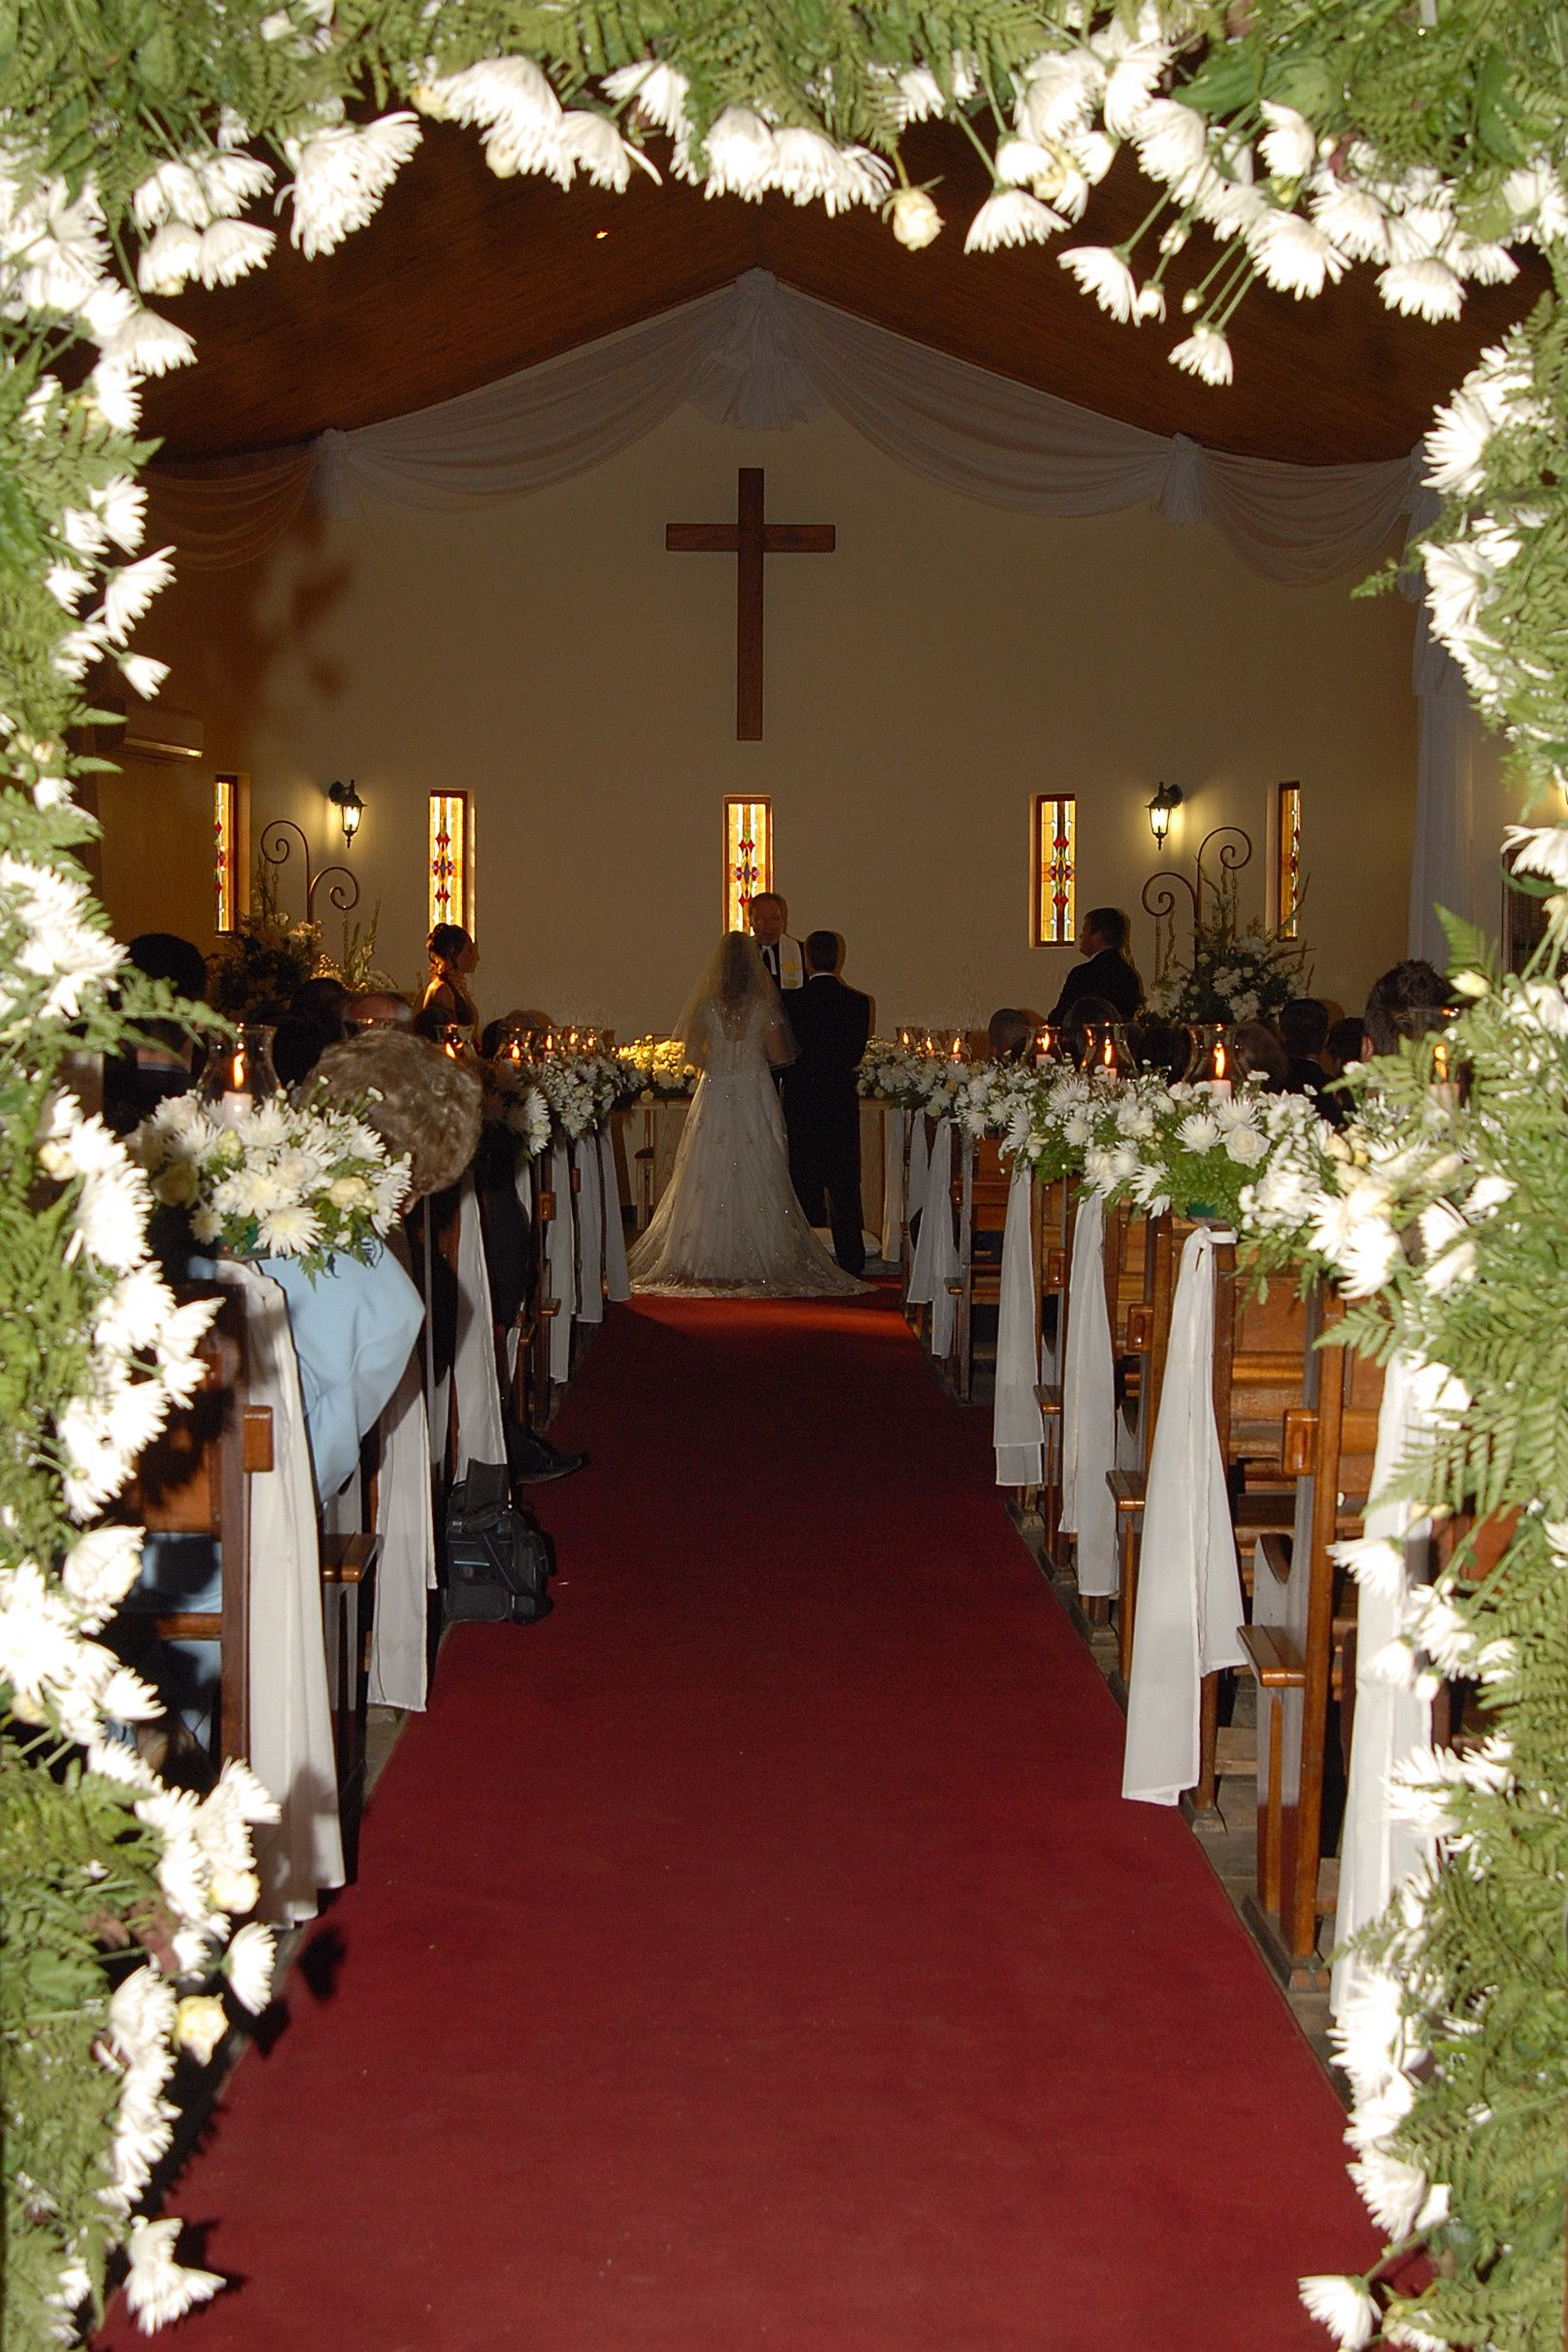 Decorating For A Wedding Vintage Wedding Church Wedding Church Decoration 1 Description